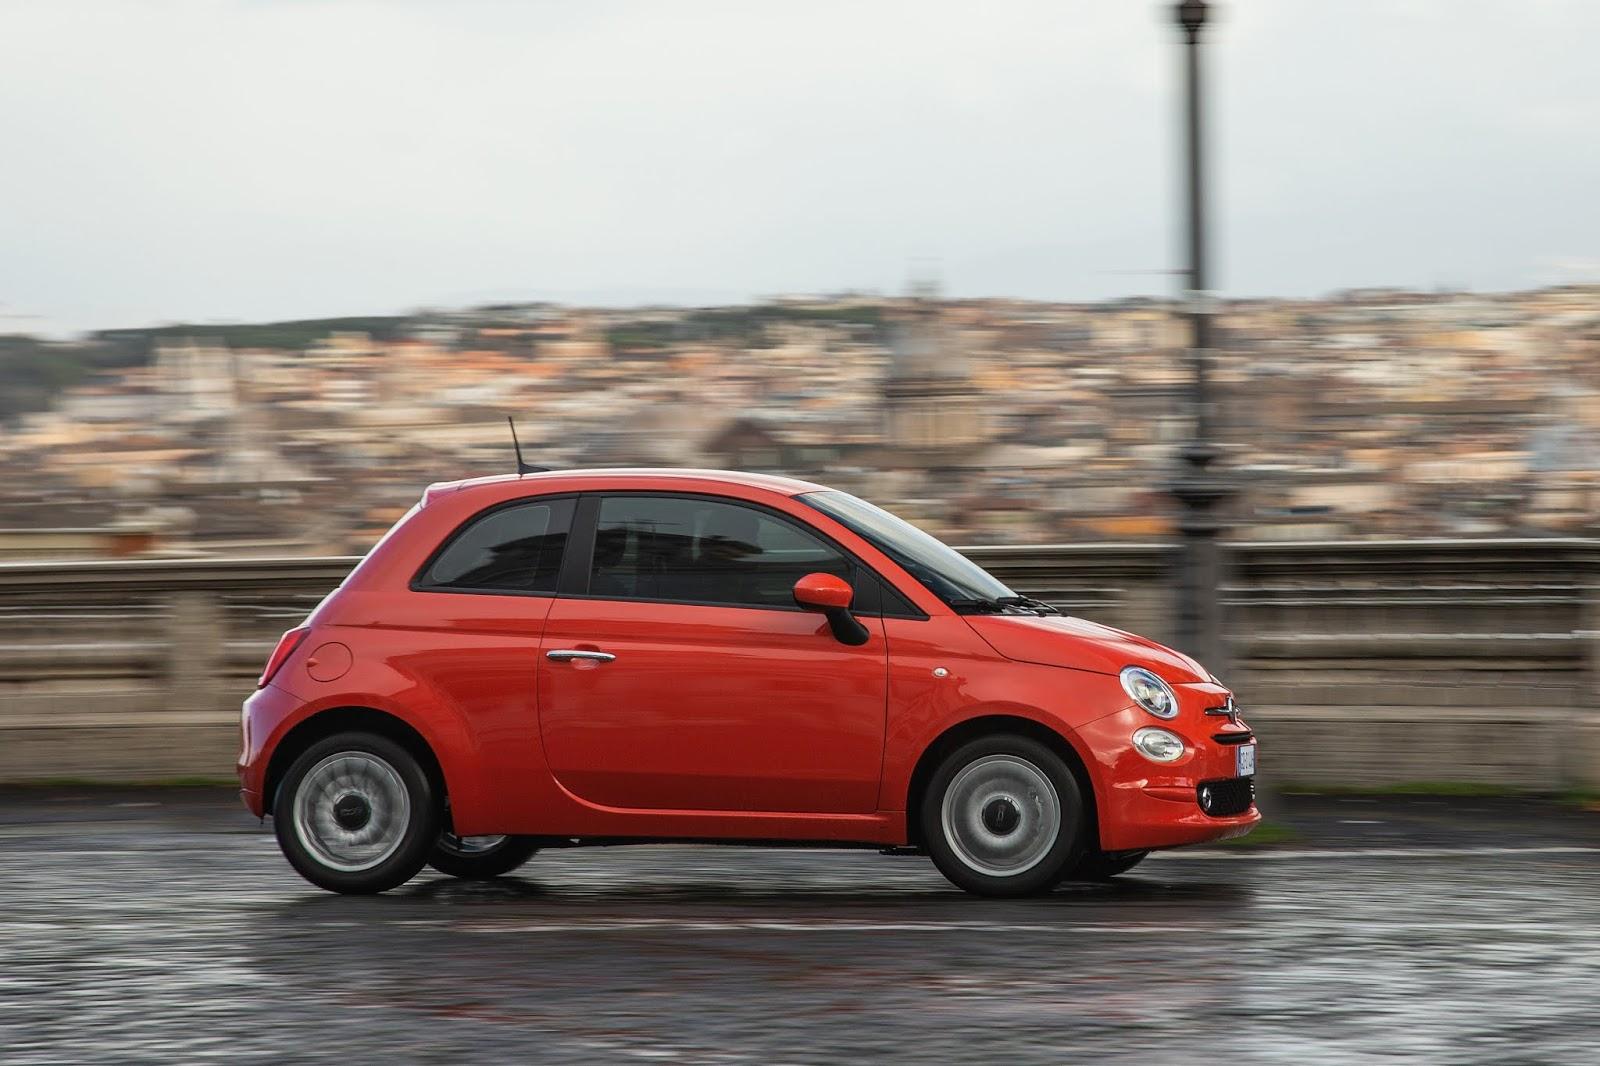 04 5002BCULT Η νέα σειρά Fiat 500 είναι διαθέσιμη στην Ελλάδα (& video)